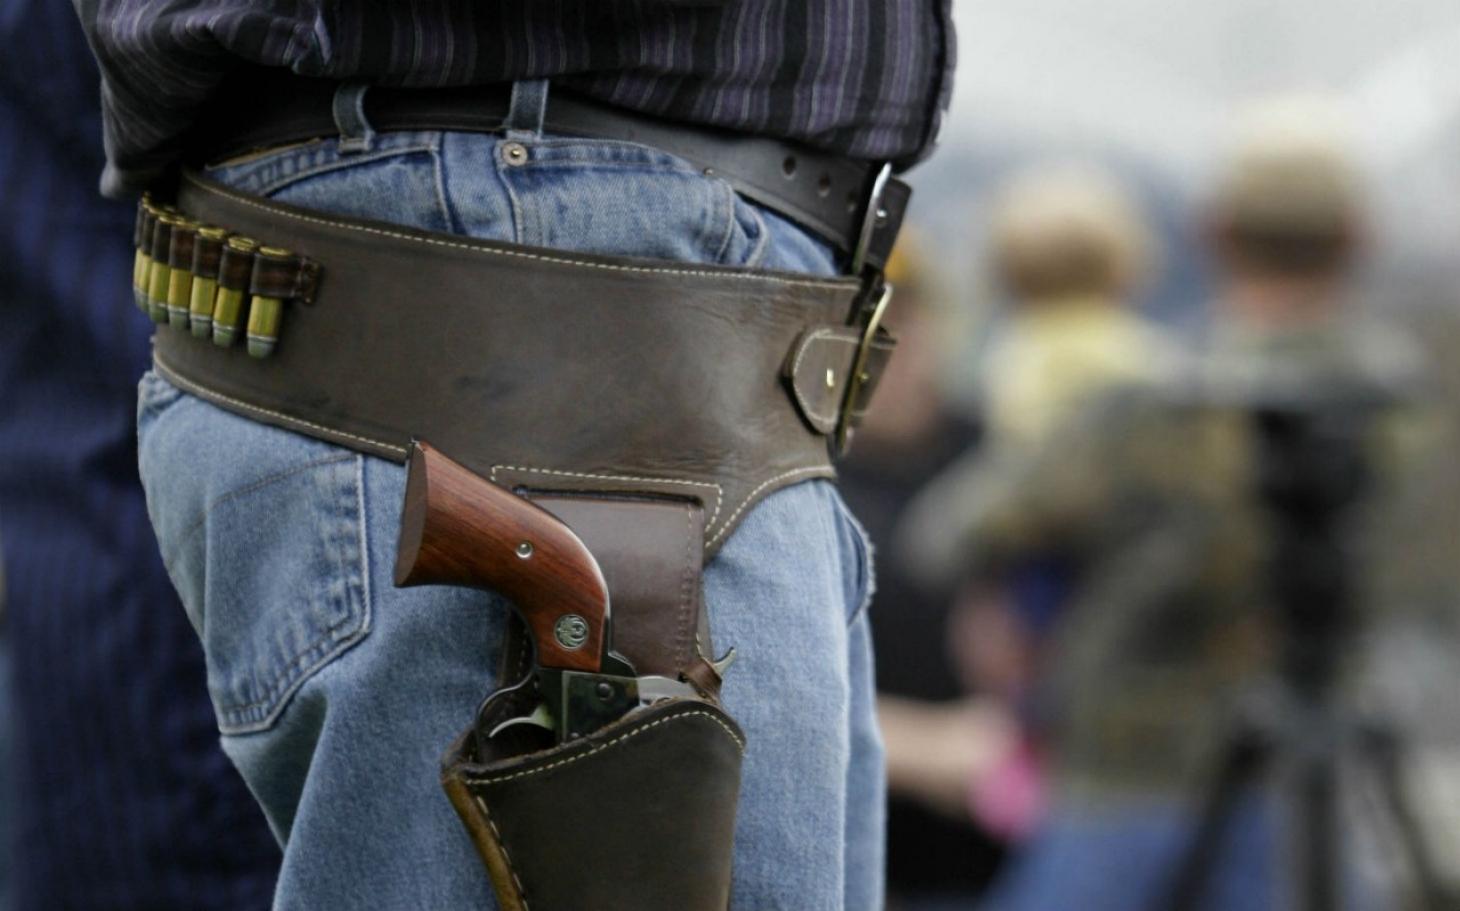 Obama To Explore Bypassing Congress Gun Control Al Jazeera America HeadlineImage Obama To Explore Bypassing Congress On Gun Control Measures